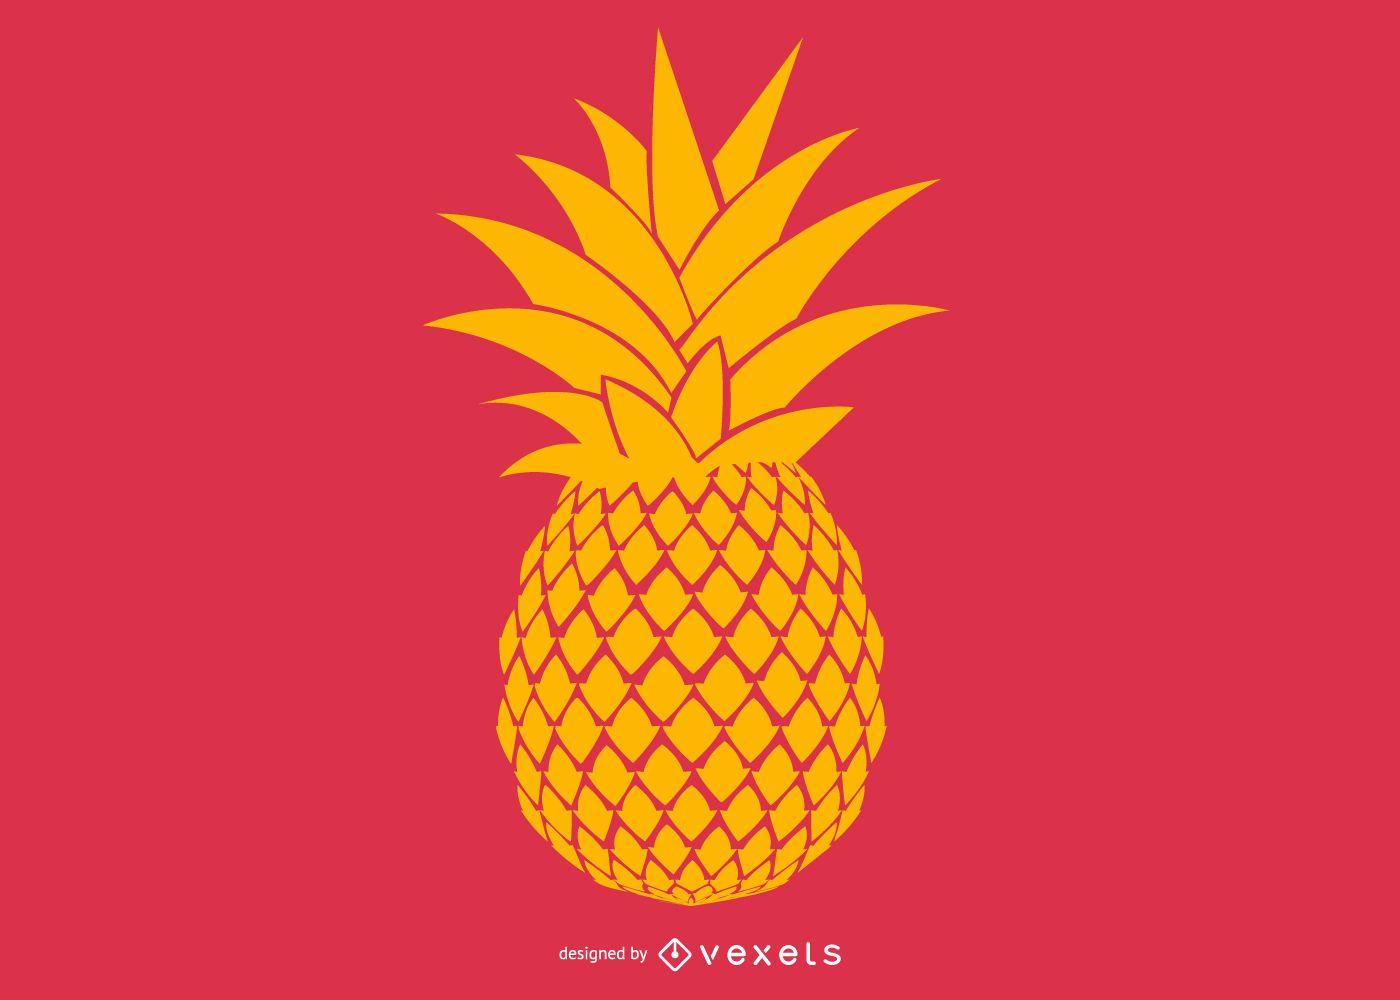 Ananas-Illustrationsdesign